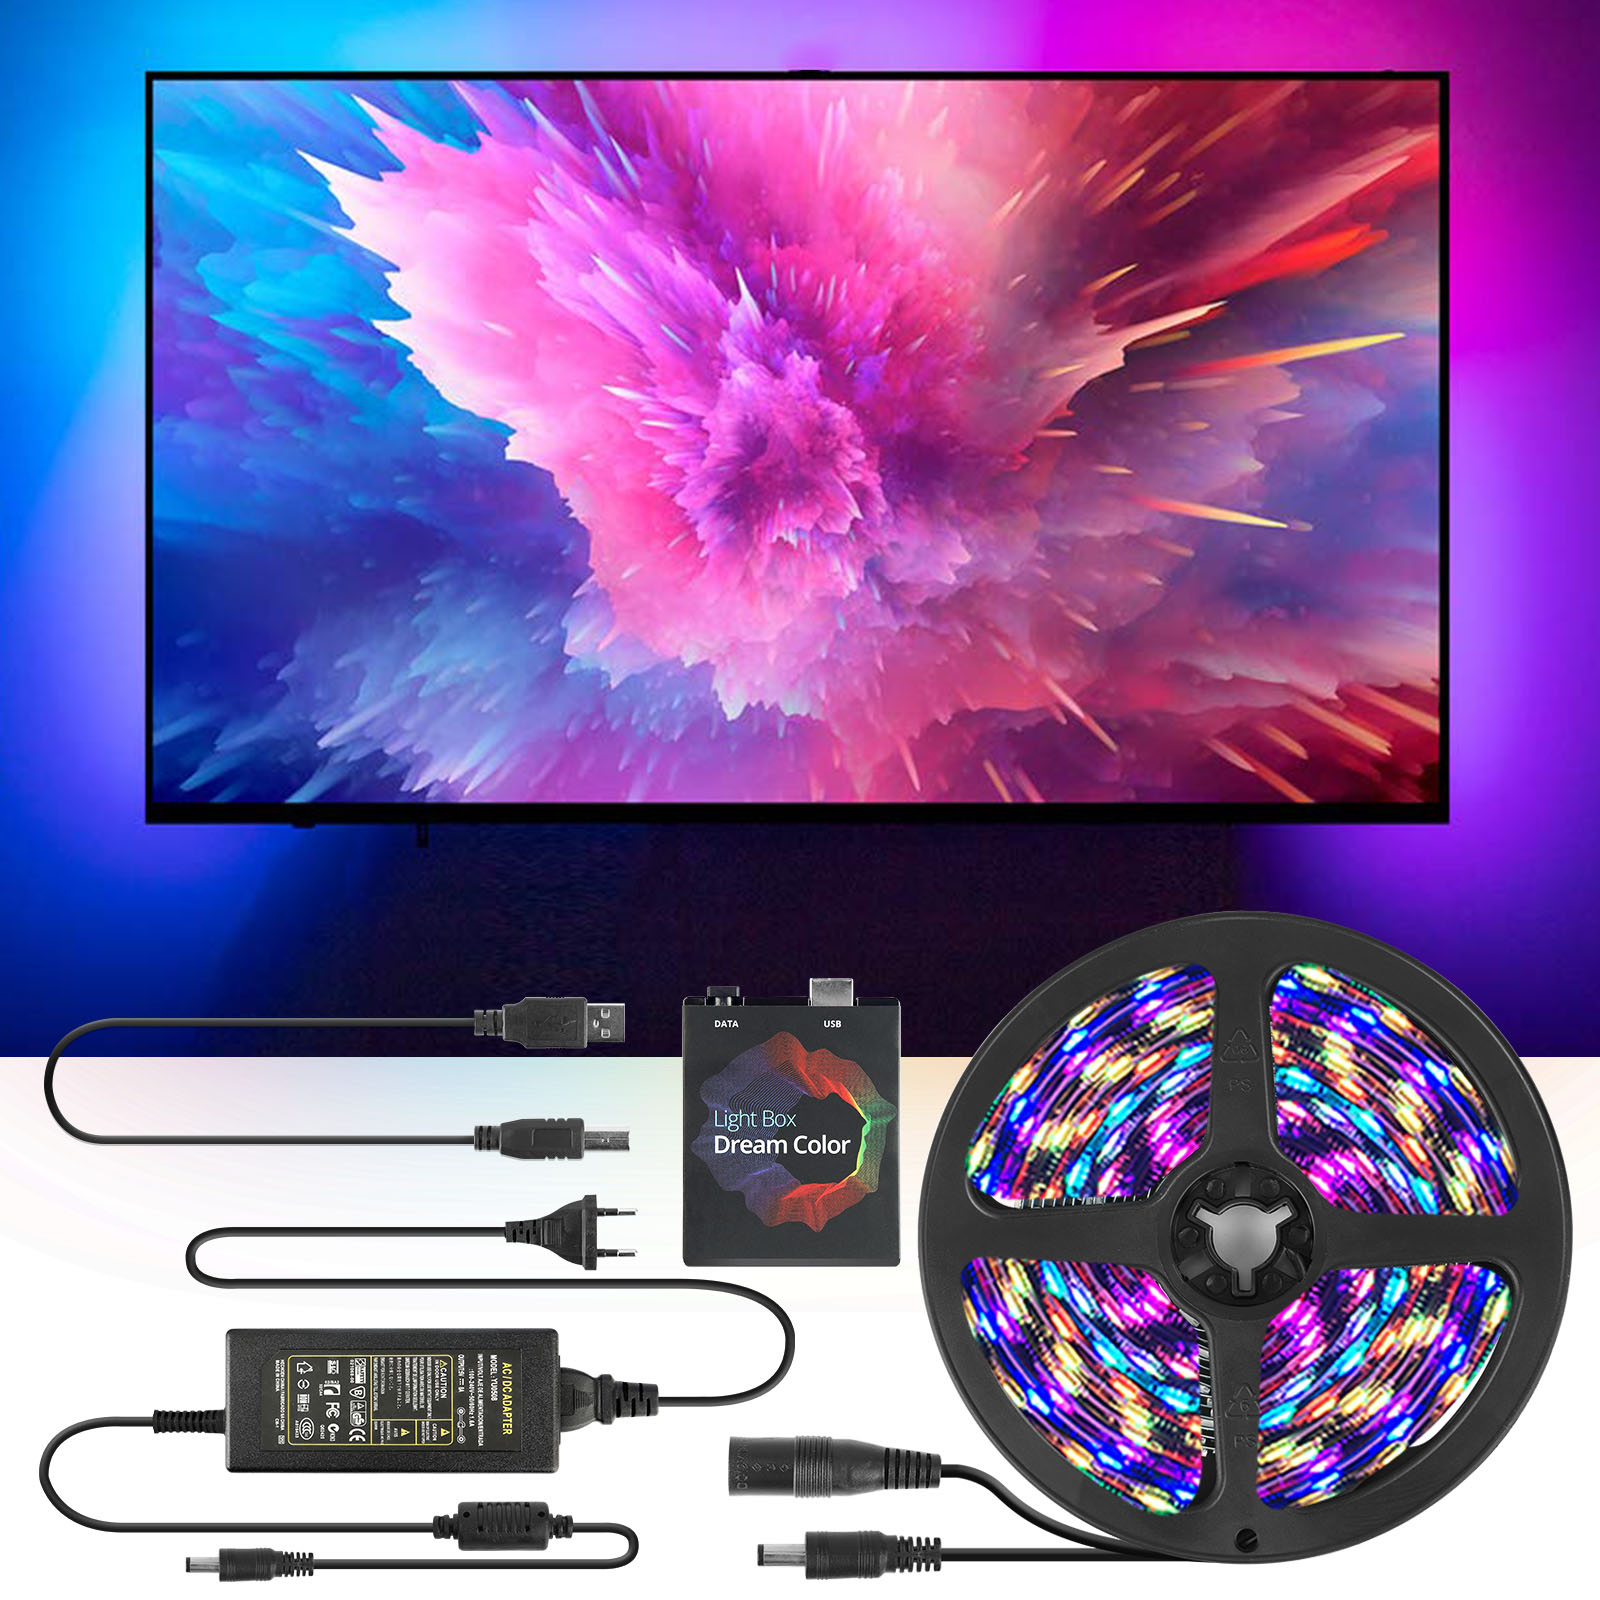 5V RGB USB LED Strip Light 5050 SMD Android Ambilight -TV Desktop PC Backlight Addressable Ws2812b Pixel Strip1M 2M 3M 4M 5M Kit